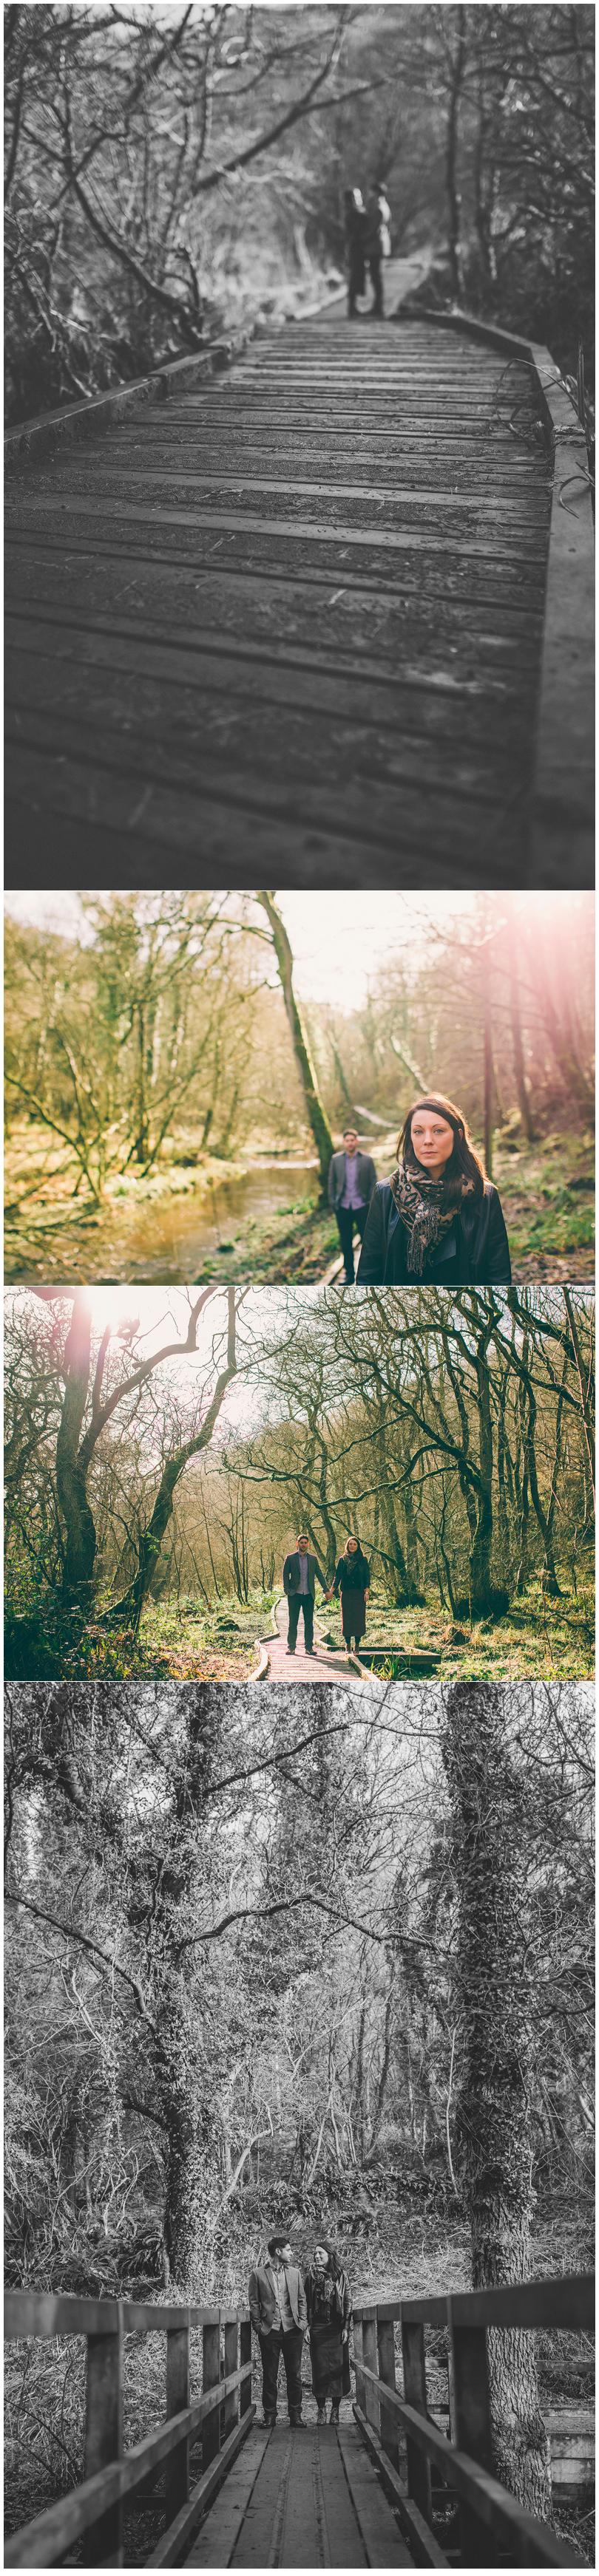 Neil_Jackson_Photographic_Scarborough_York_Yorkshire_Wedding_Photographer_Julie_Jon_Forge_Valley_Engagement_Shoot_Scarborough_Blog3